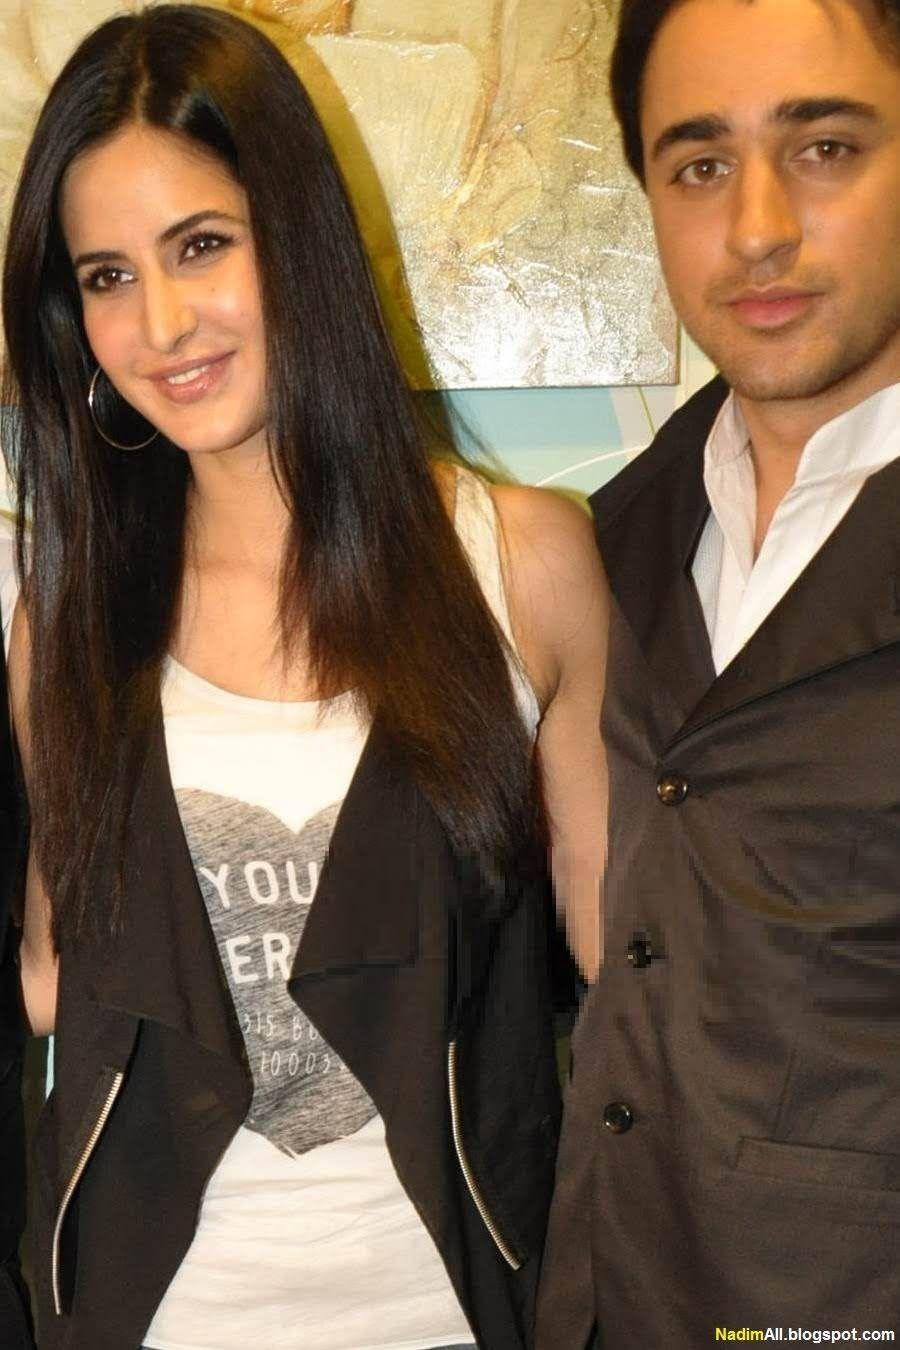 Katrina Kaif At Reality Show X Factor 2011 Katrina Kaif Priyanka Chopra Makeup Katrina